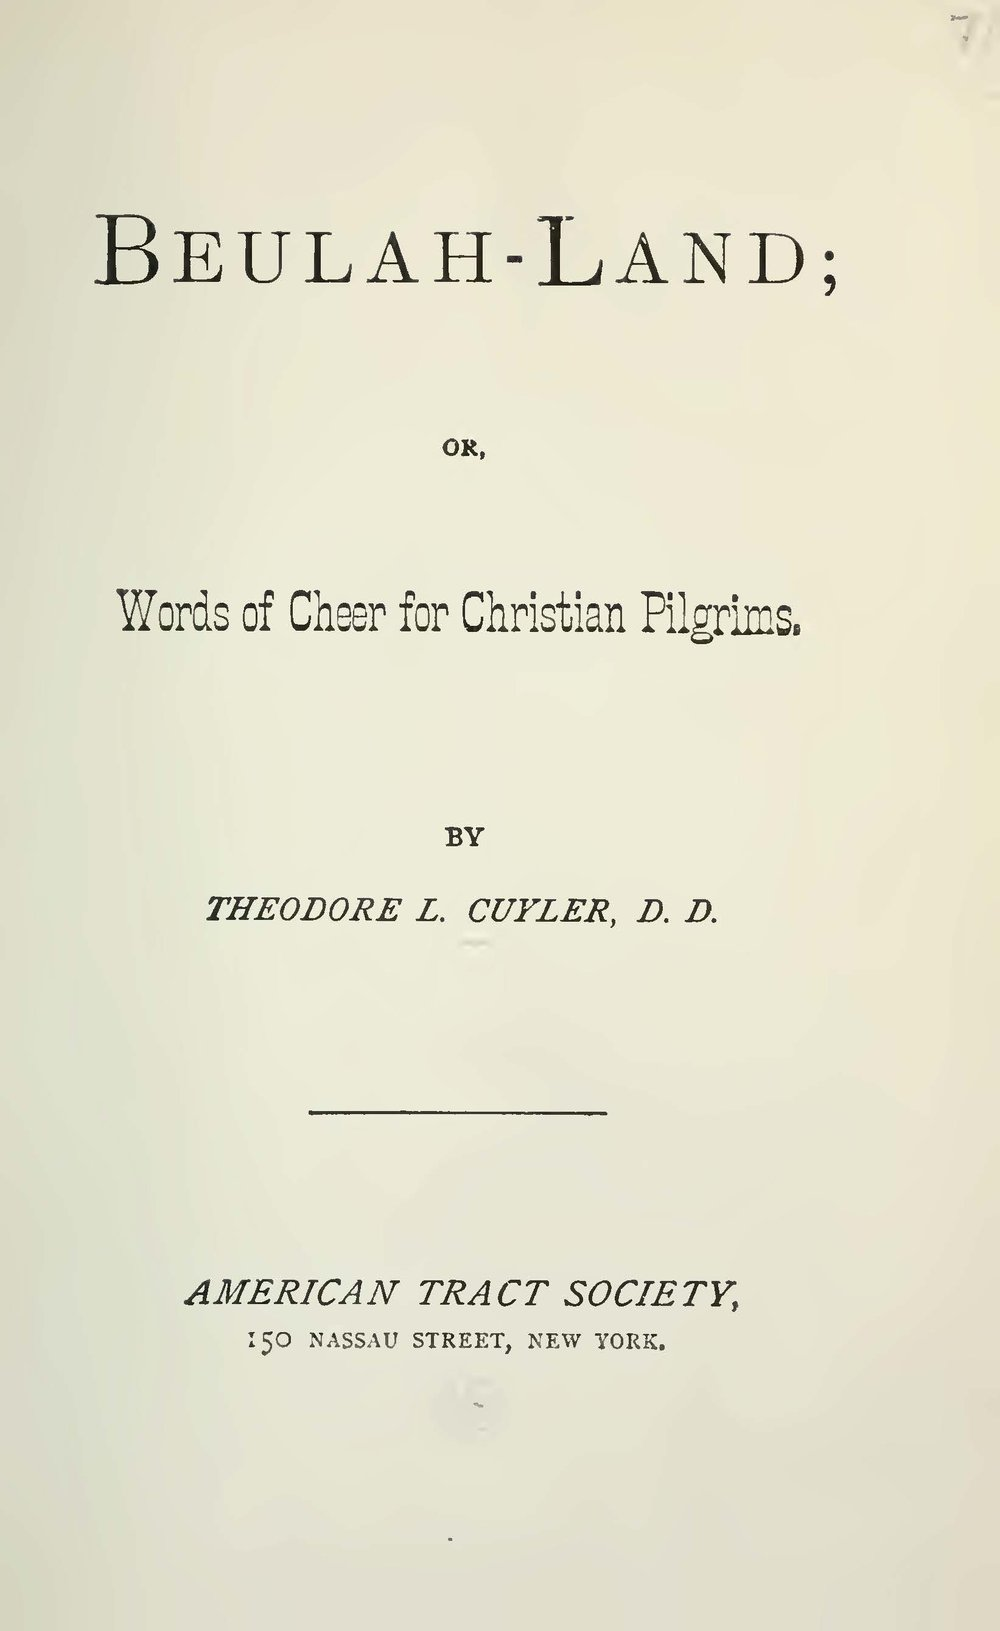 Cuyler, Theodore Ledyard, Beulah-Land Title Page.jpg